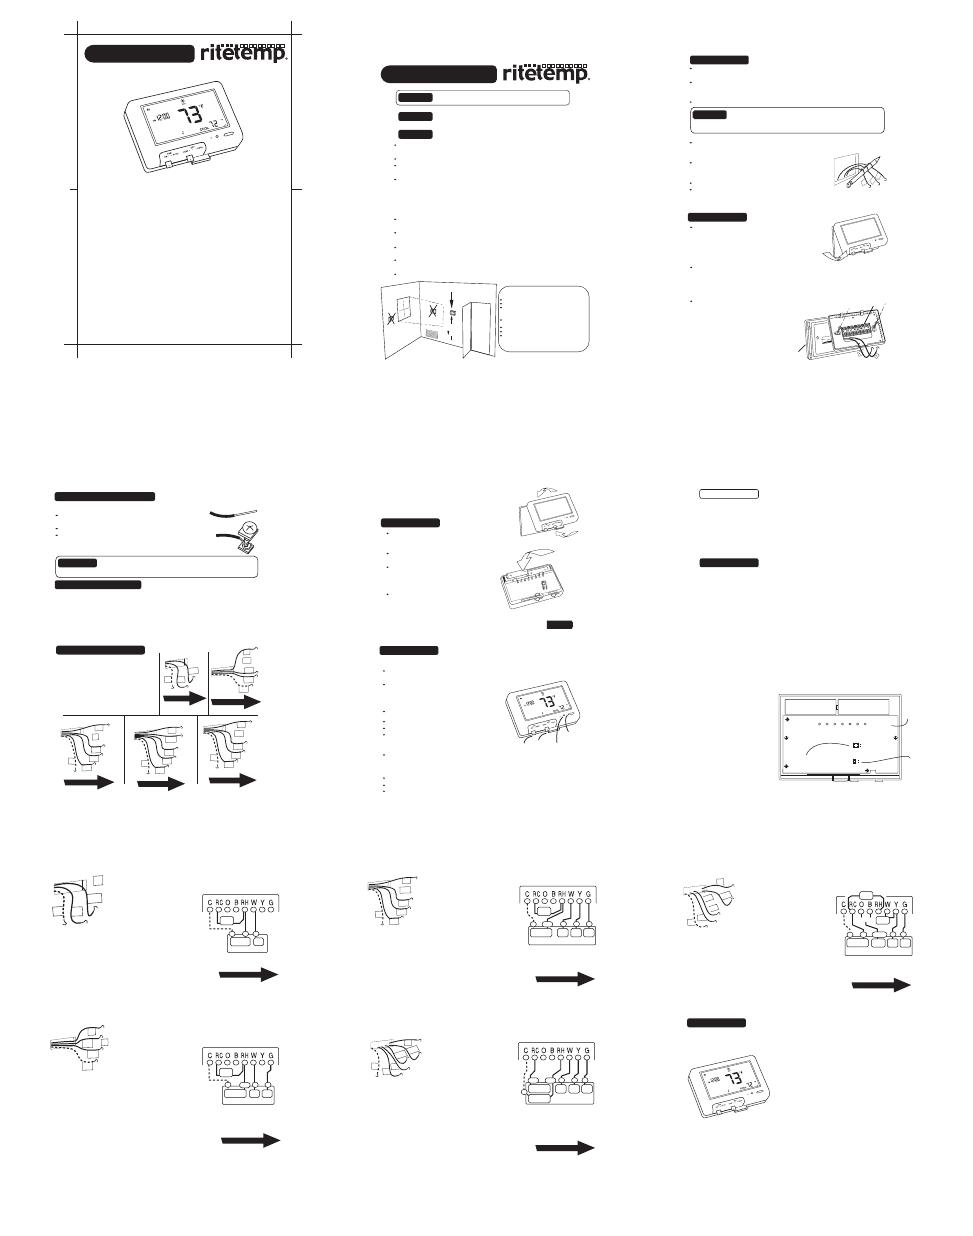 [NRIO_4796]   ZD_5669] Rite Temp Thermostat Wiring Diagram 7 Wire Free Diagram | Rite Temp Thermostat Wiring Diagram 7 Wire |  | Jebrp Bemua Favo Lectr Vira Mohammedshrine Librar Wiring 101